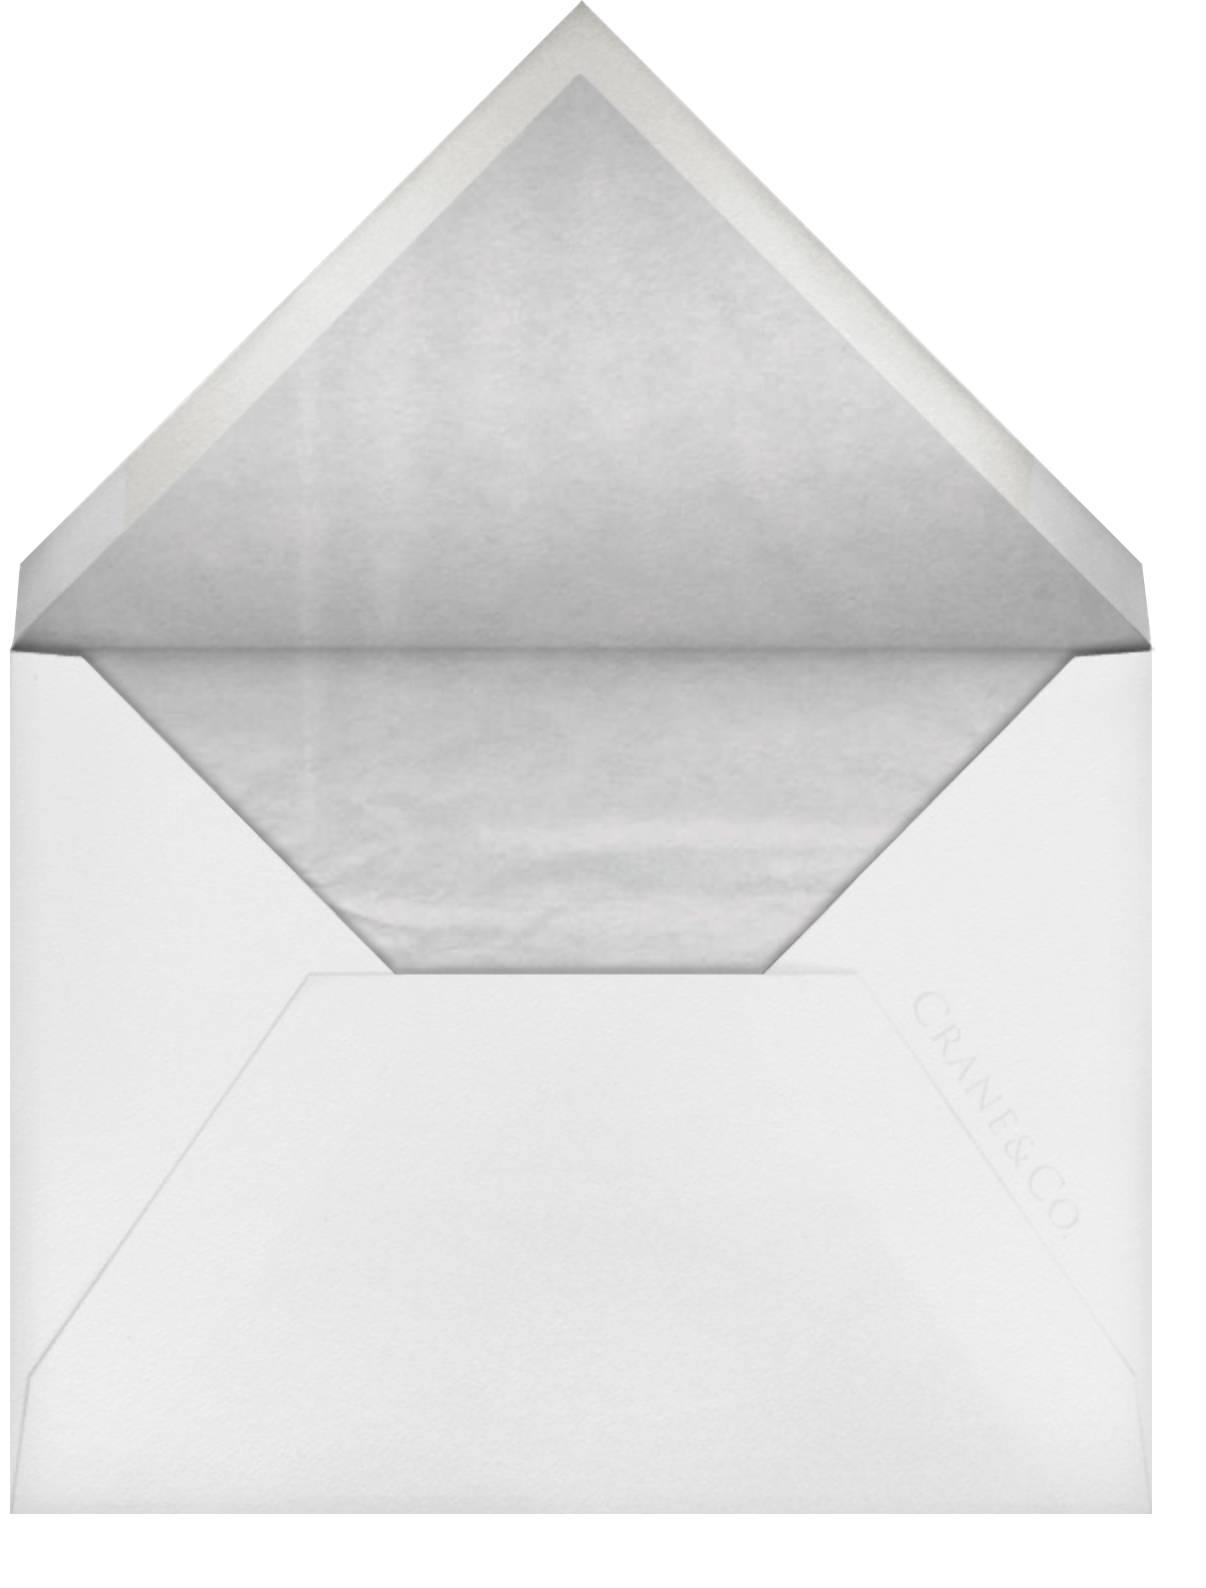 Cheverny (Thank You) - Black - Crane & Co. - Personalized stationery - envelope back